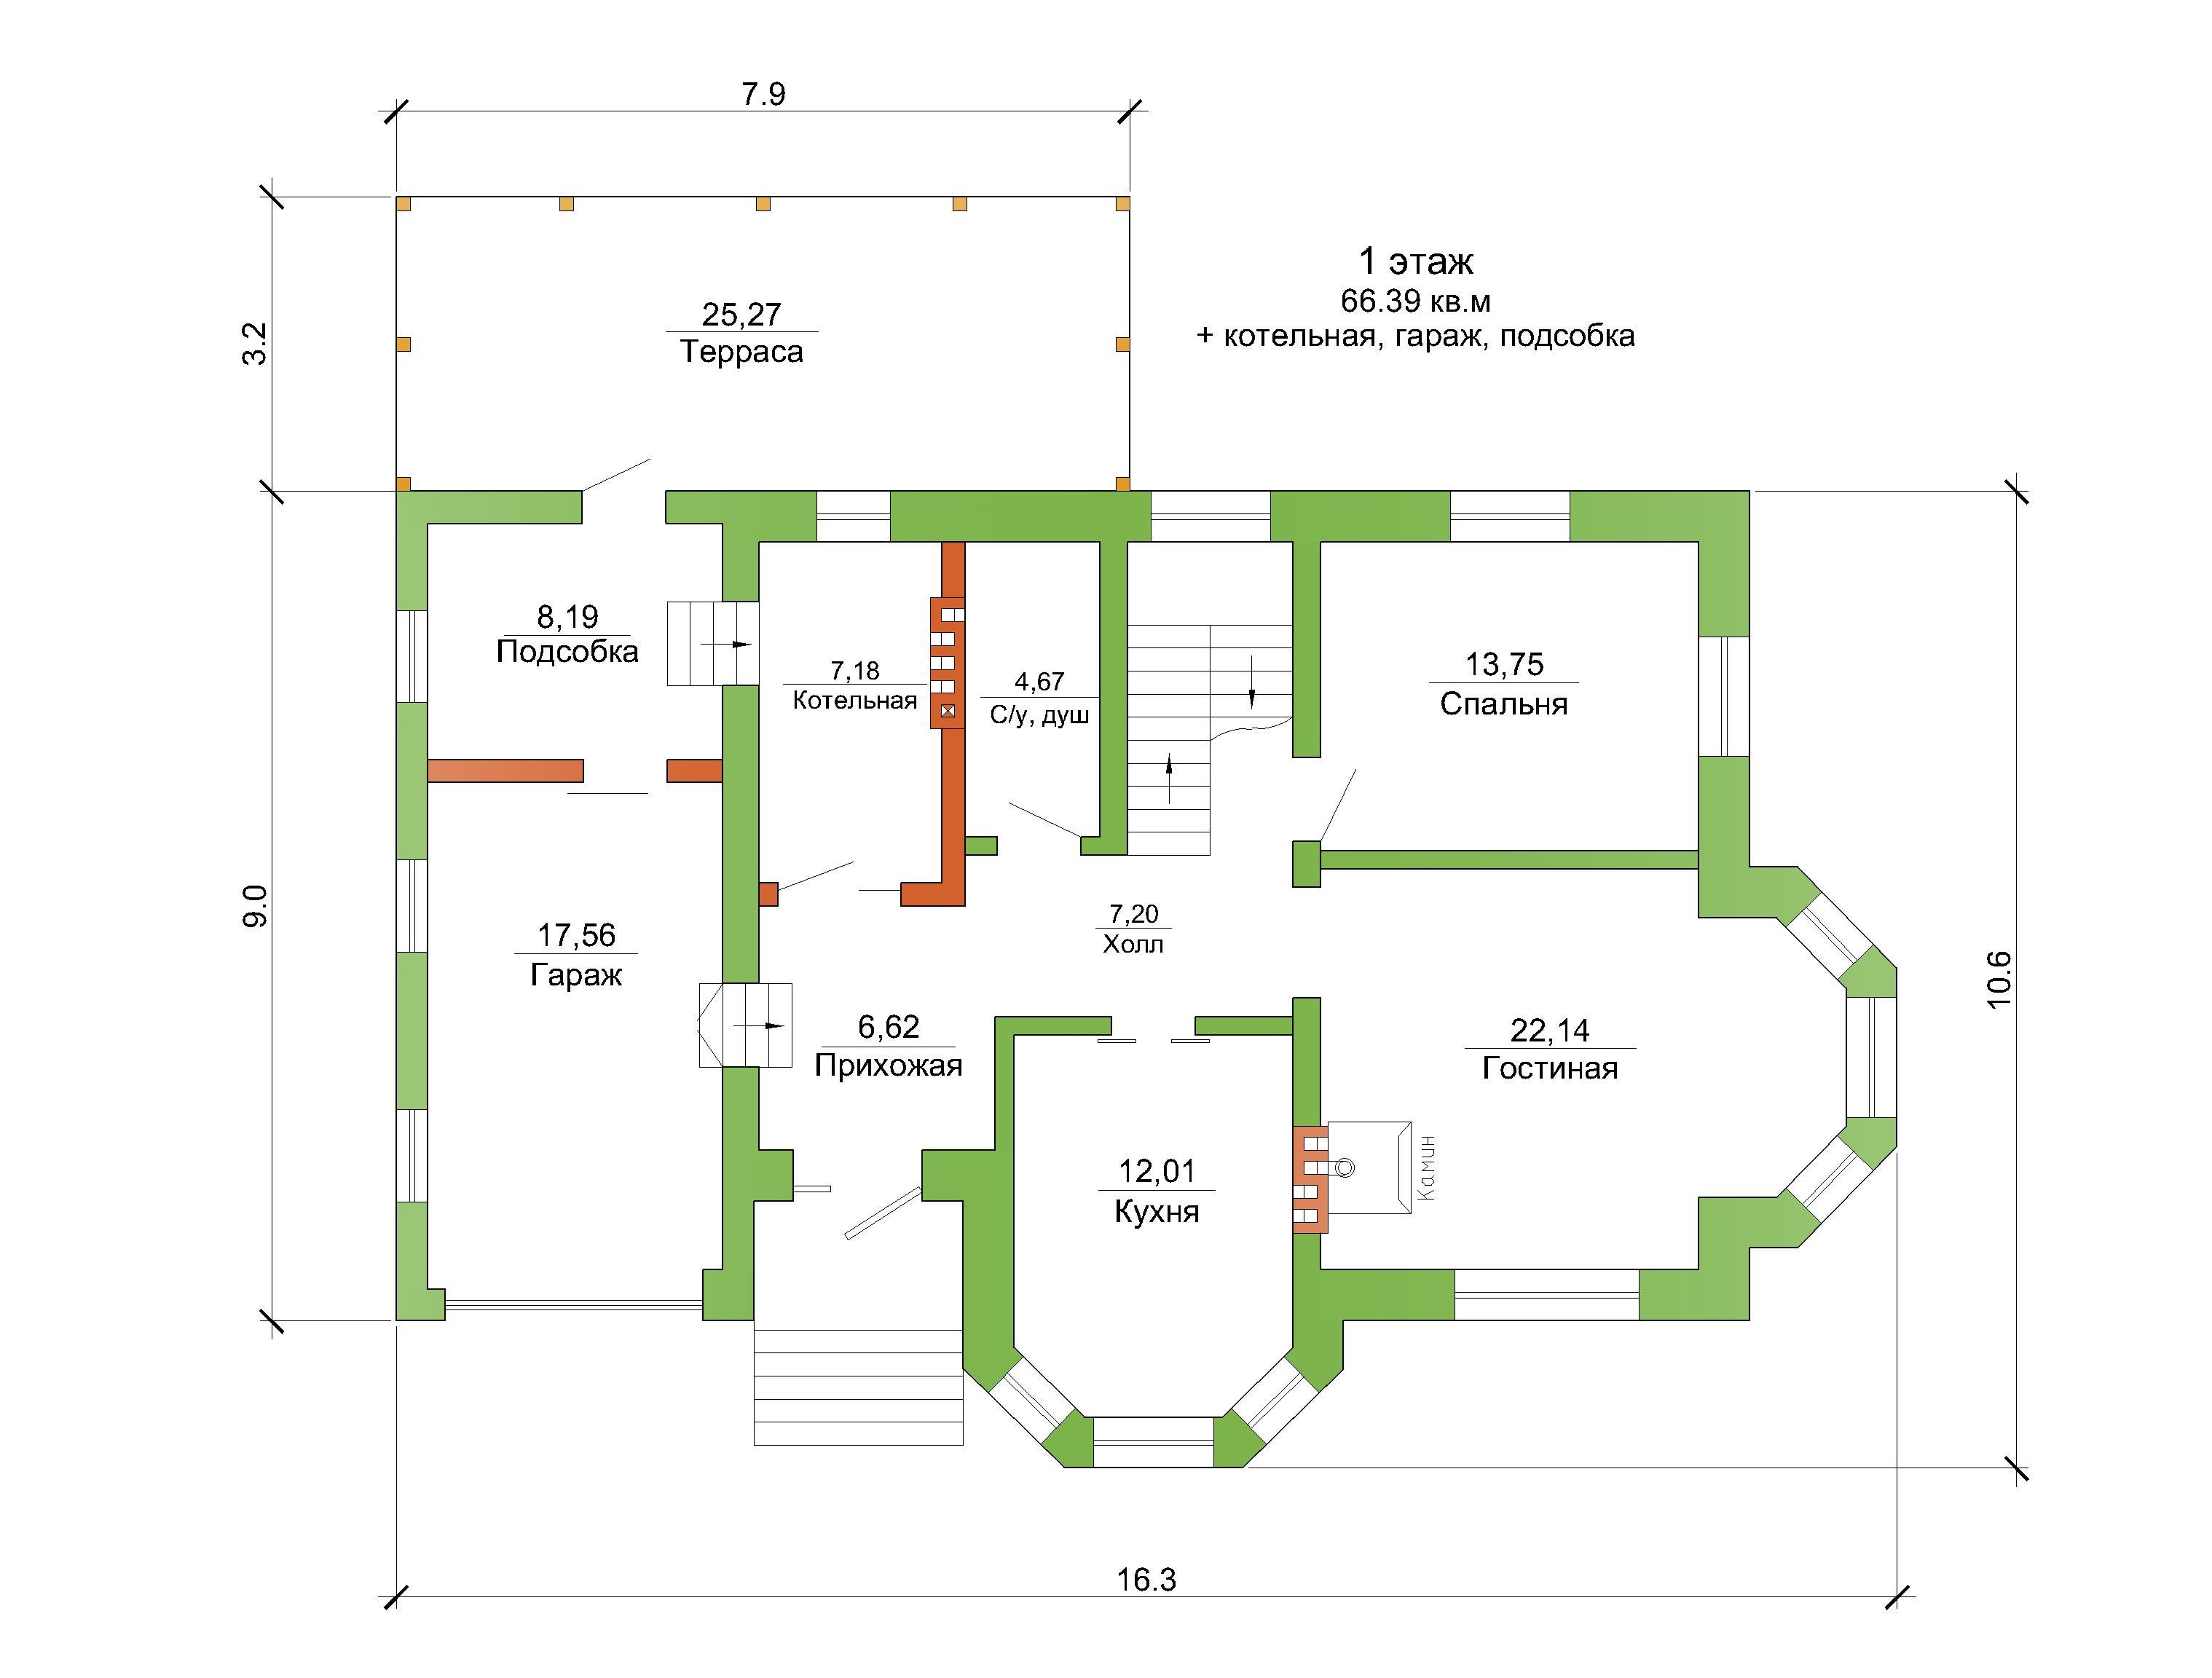 Готовый проект коттеджа 140 м2 / Артикул AM-70 план